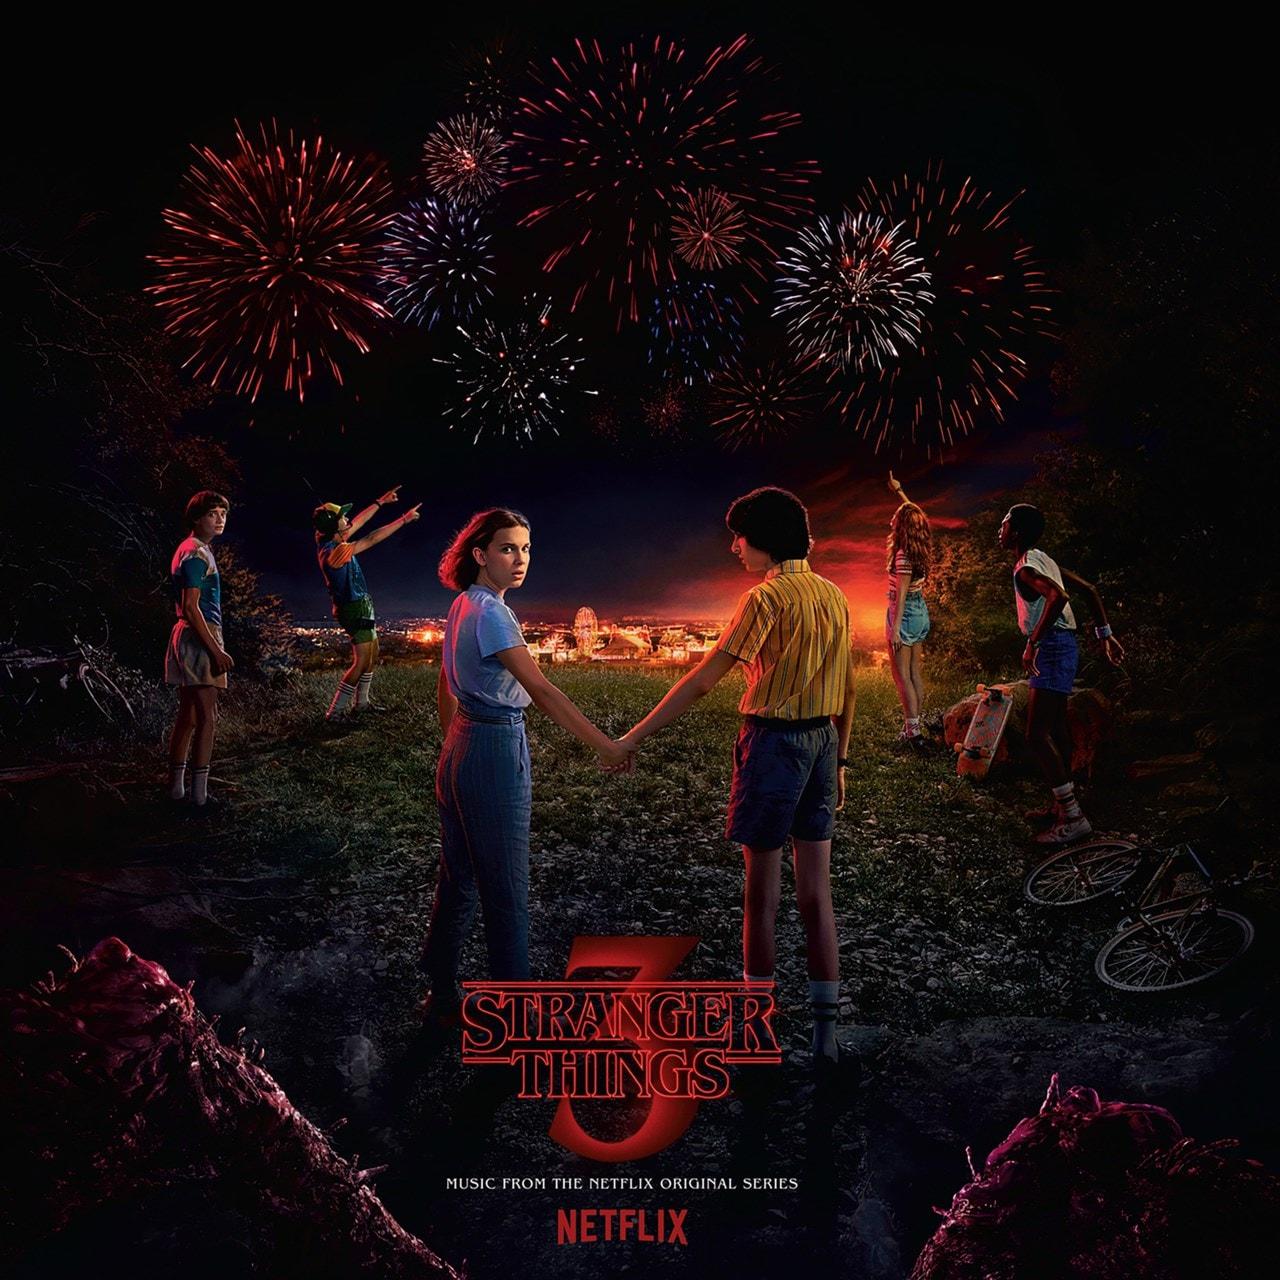 Stranger Things 3: Music from the Netflix Original Series - 1